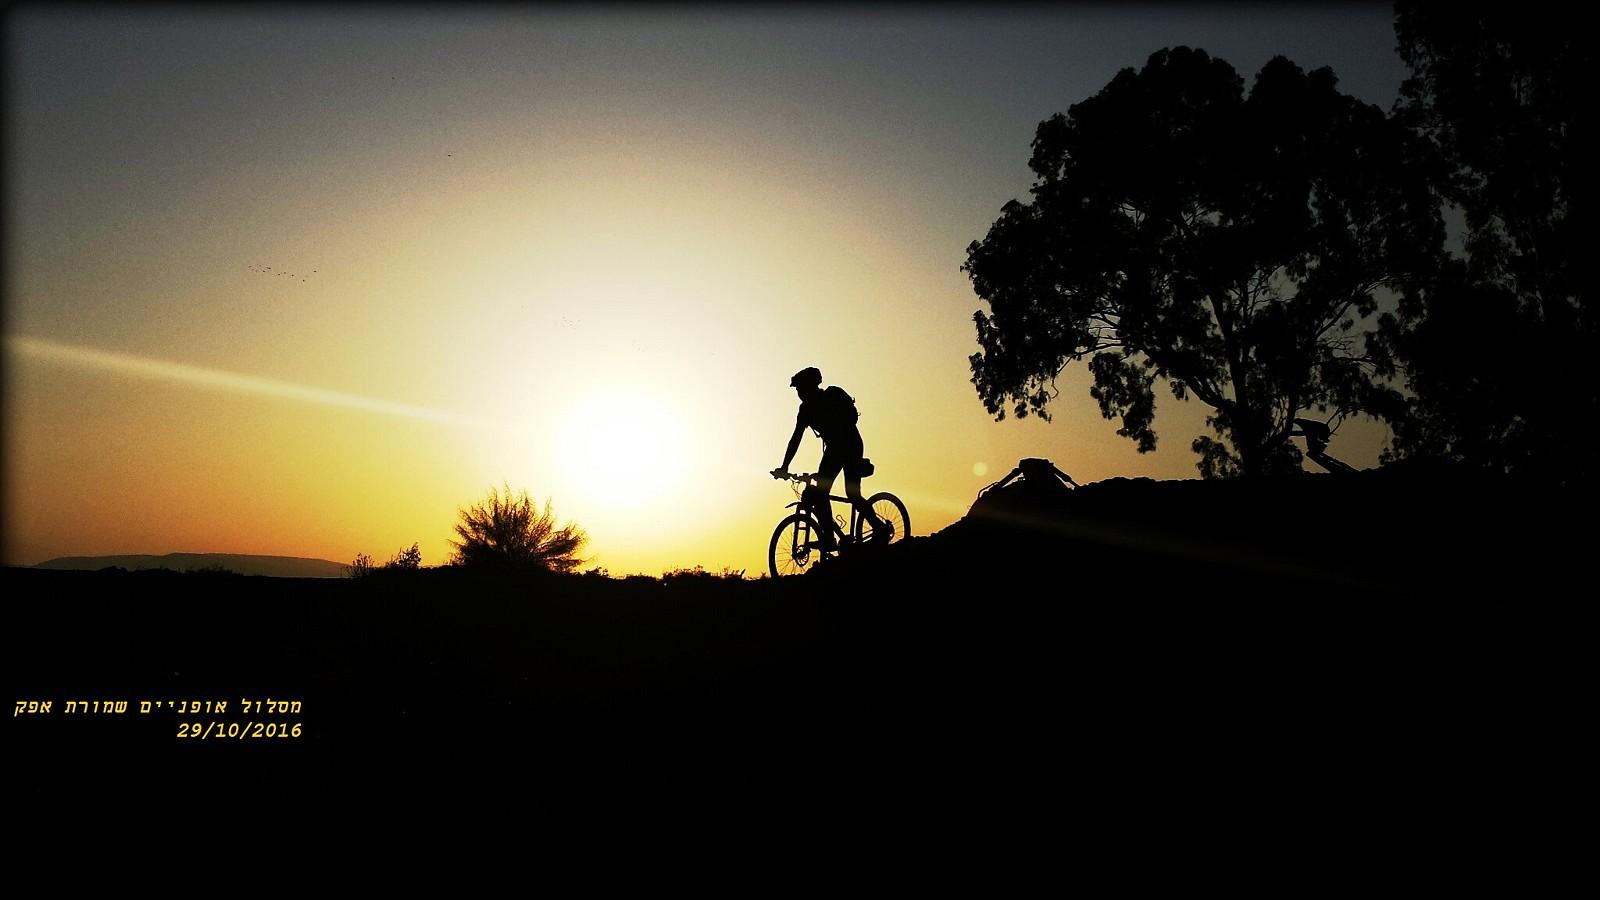 CYMERA 20161029 151622 - guy191184 - Mountain Biking Pictures - Vital MTB